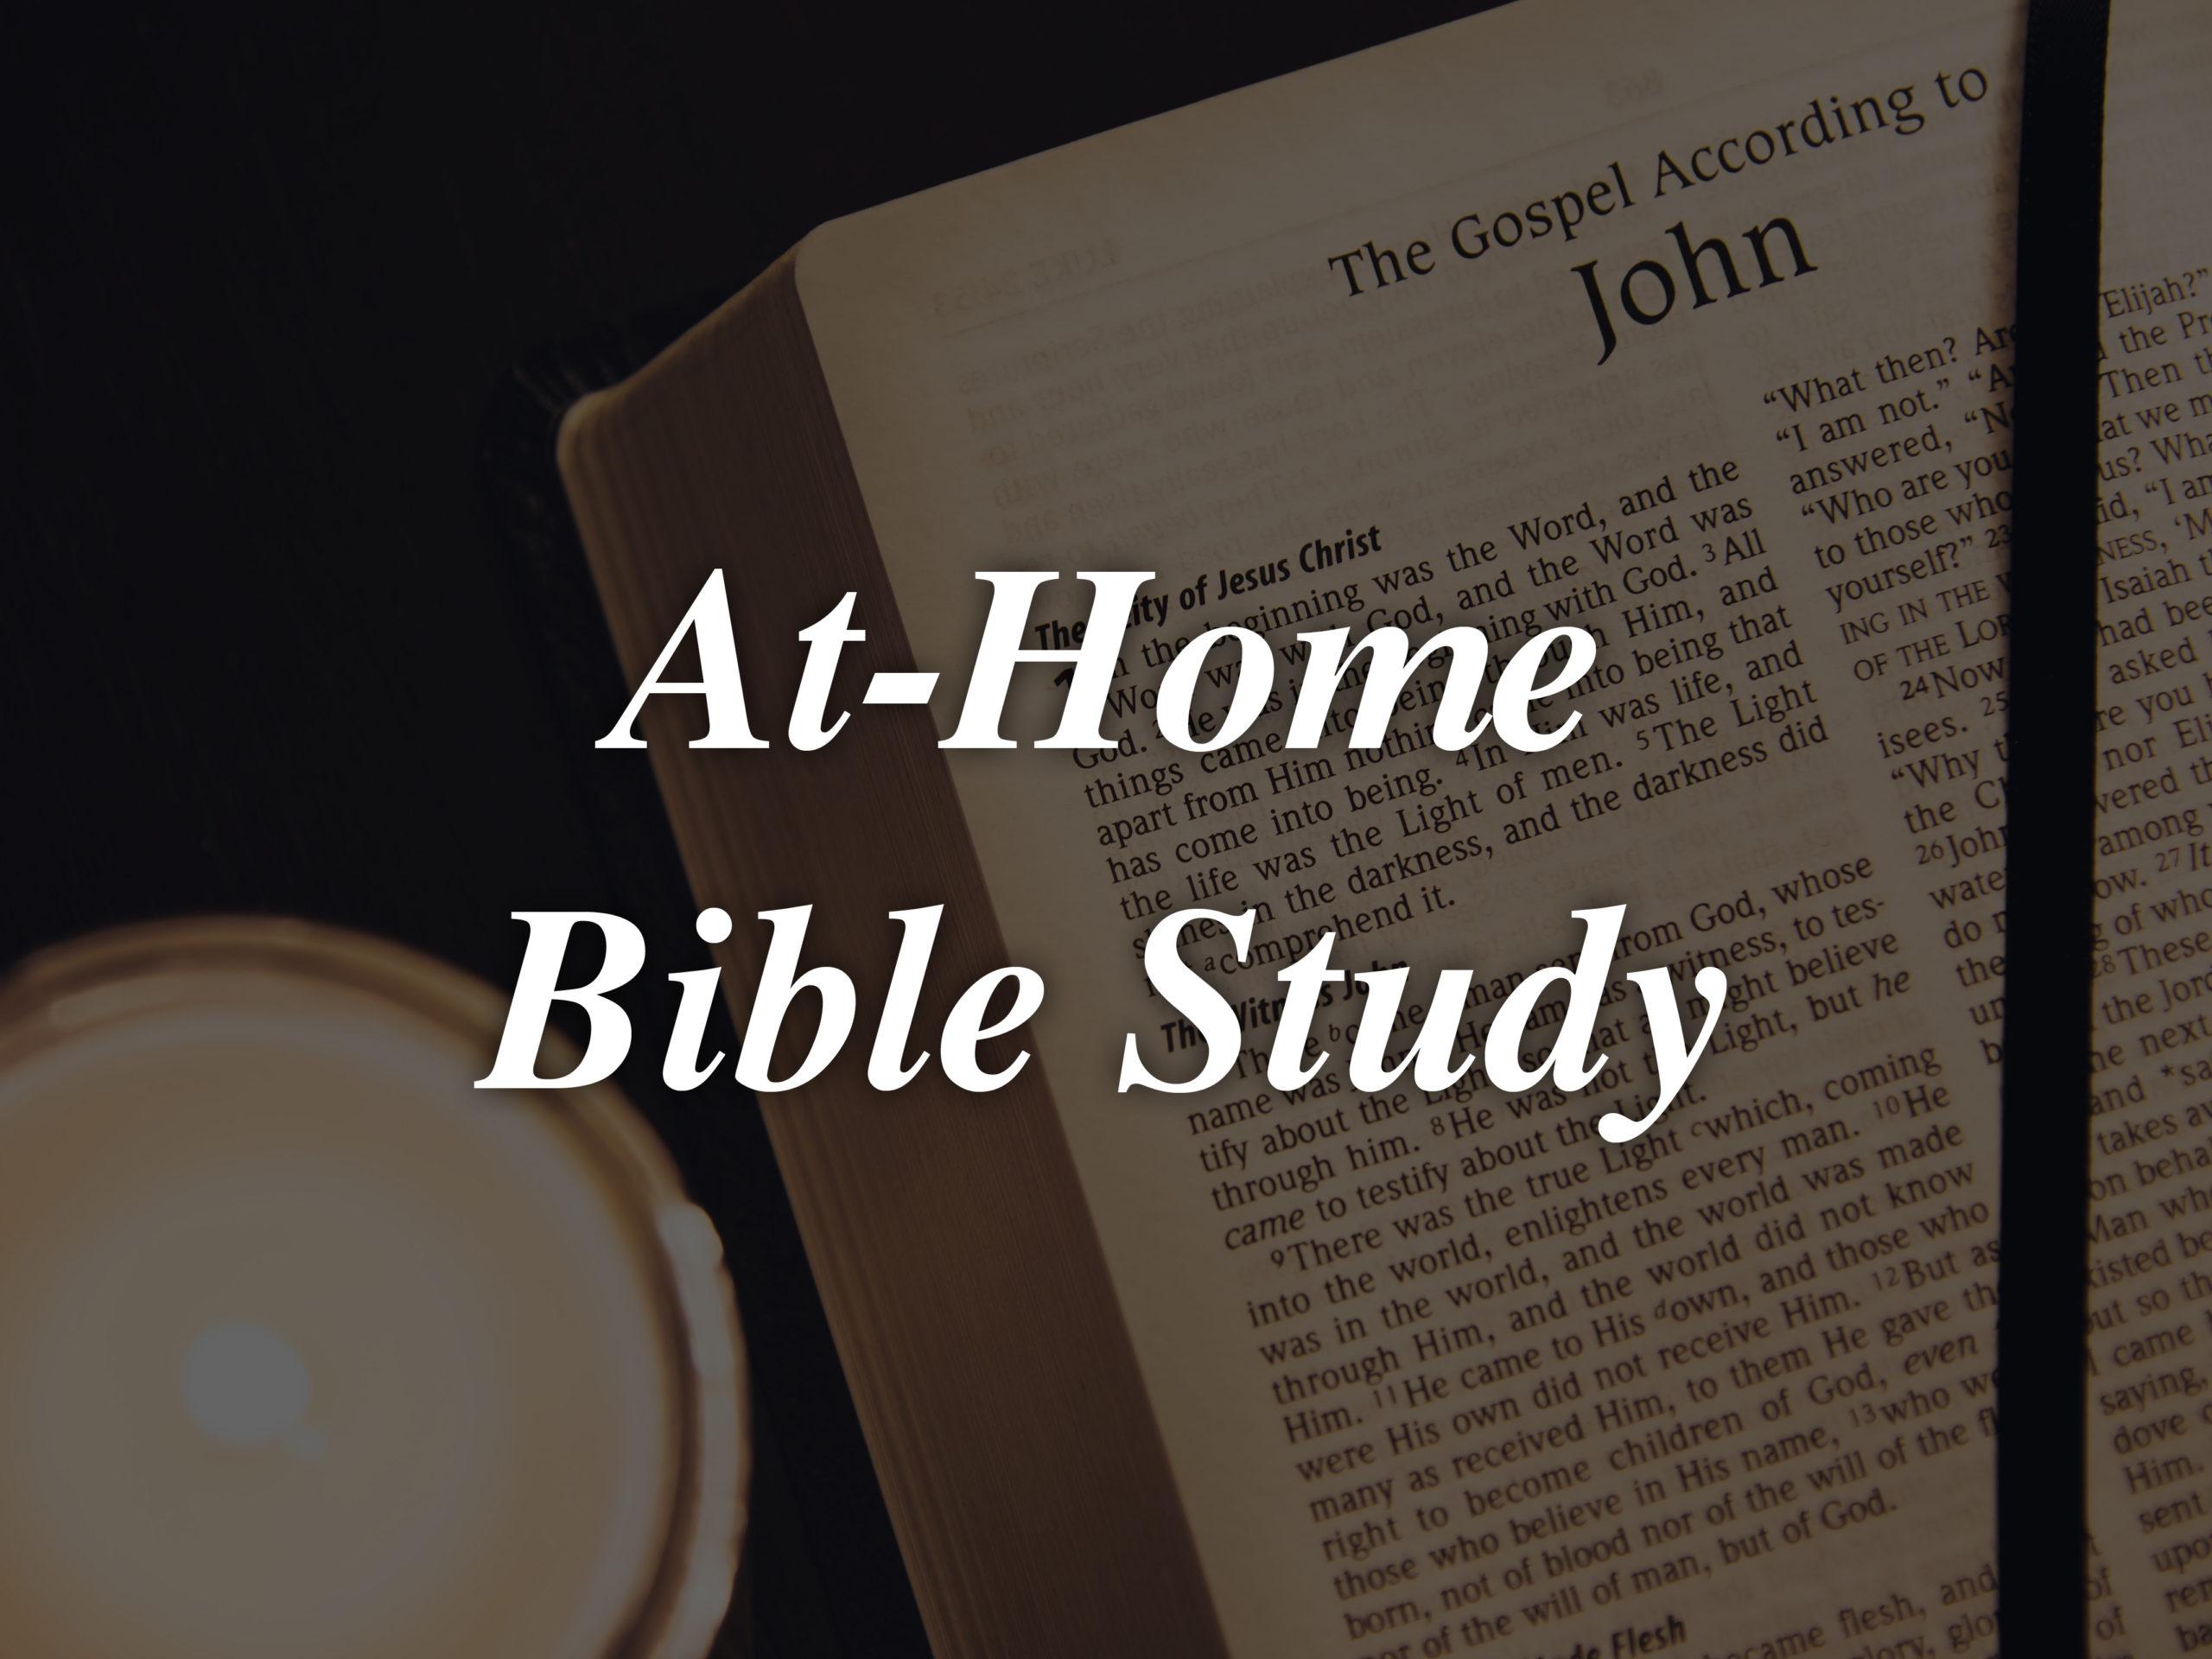 AT-HOME BIBLE STUDY - Hillsboro Church of Christ